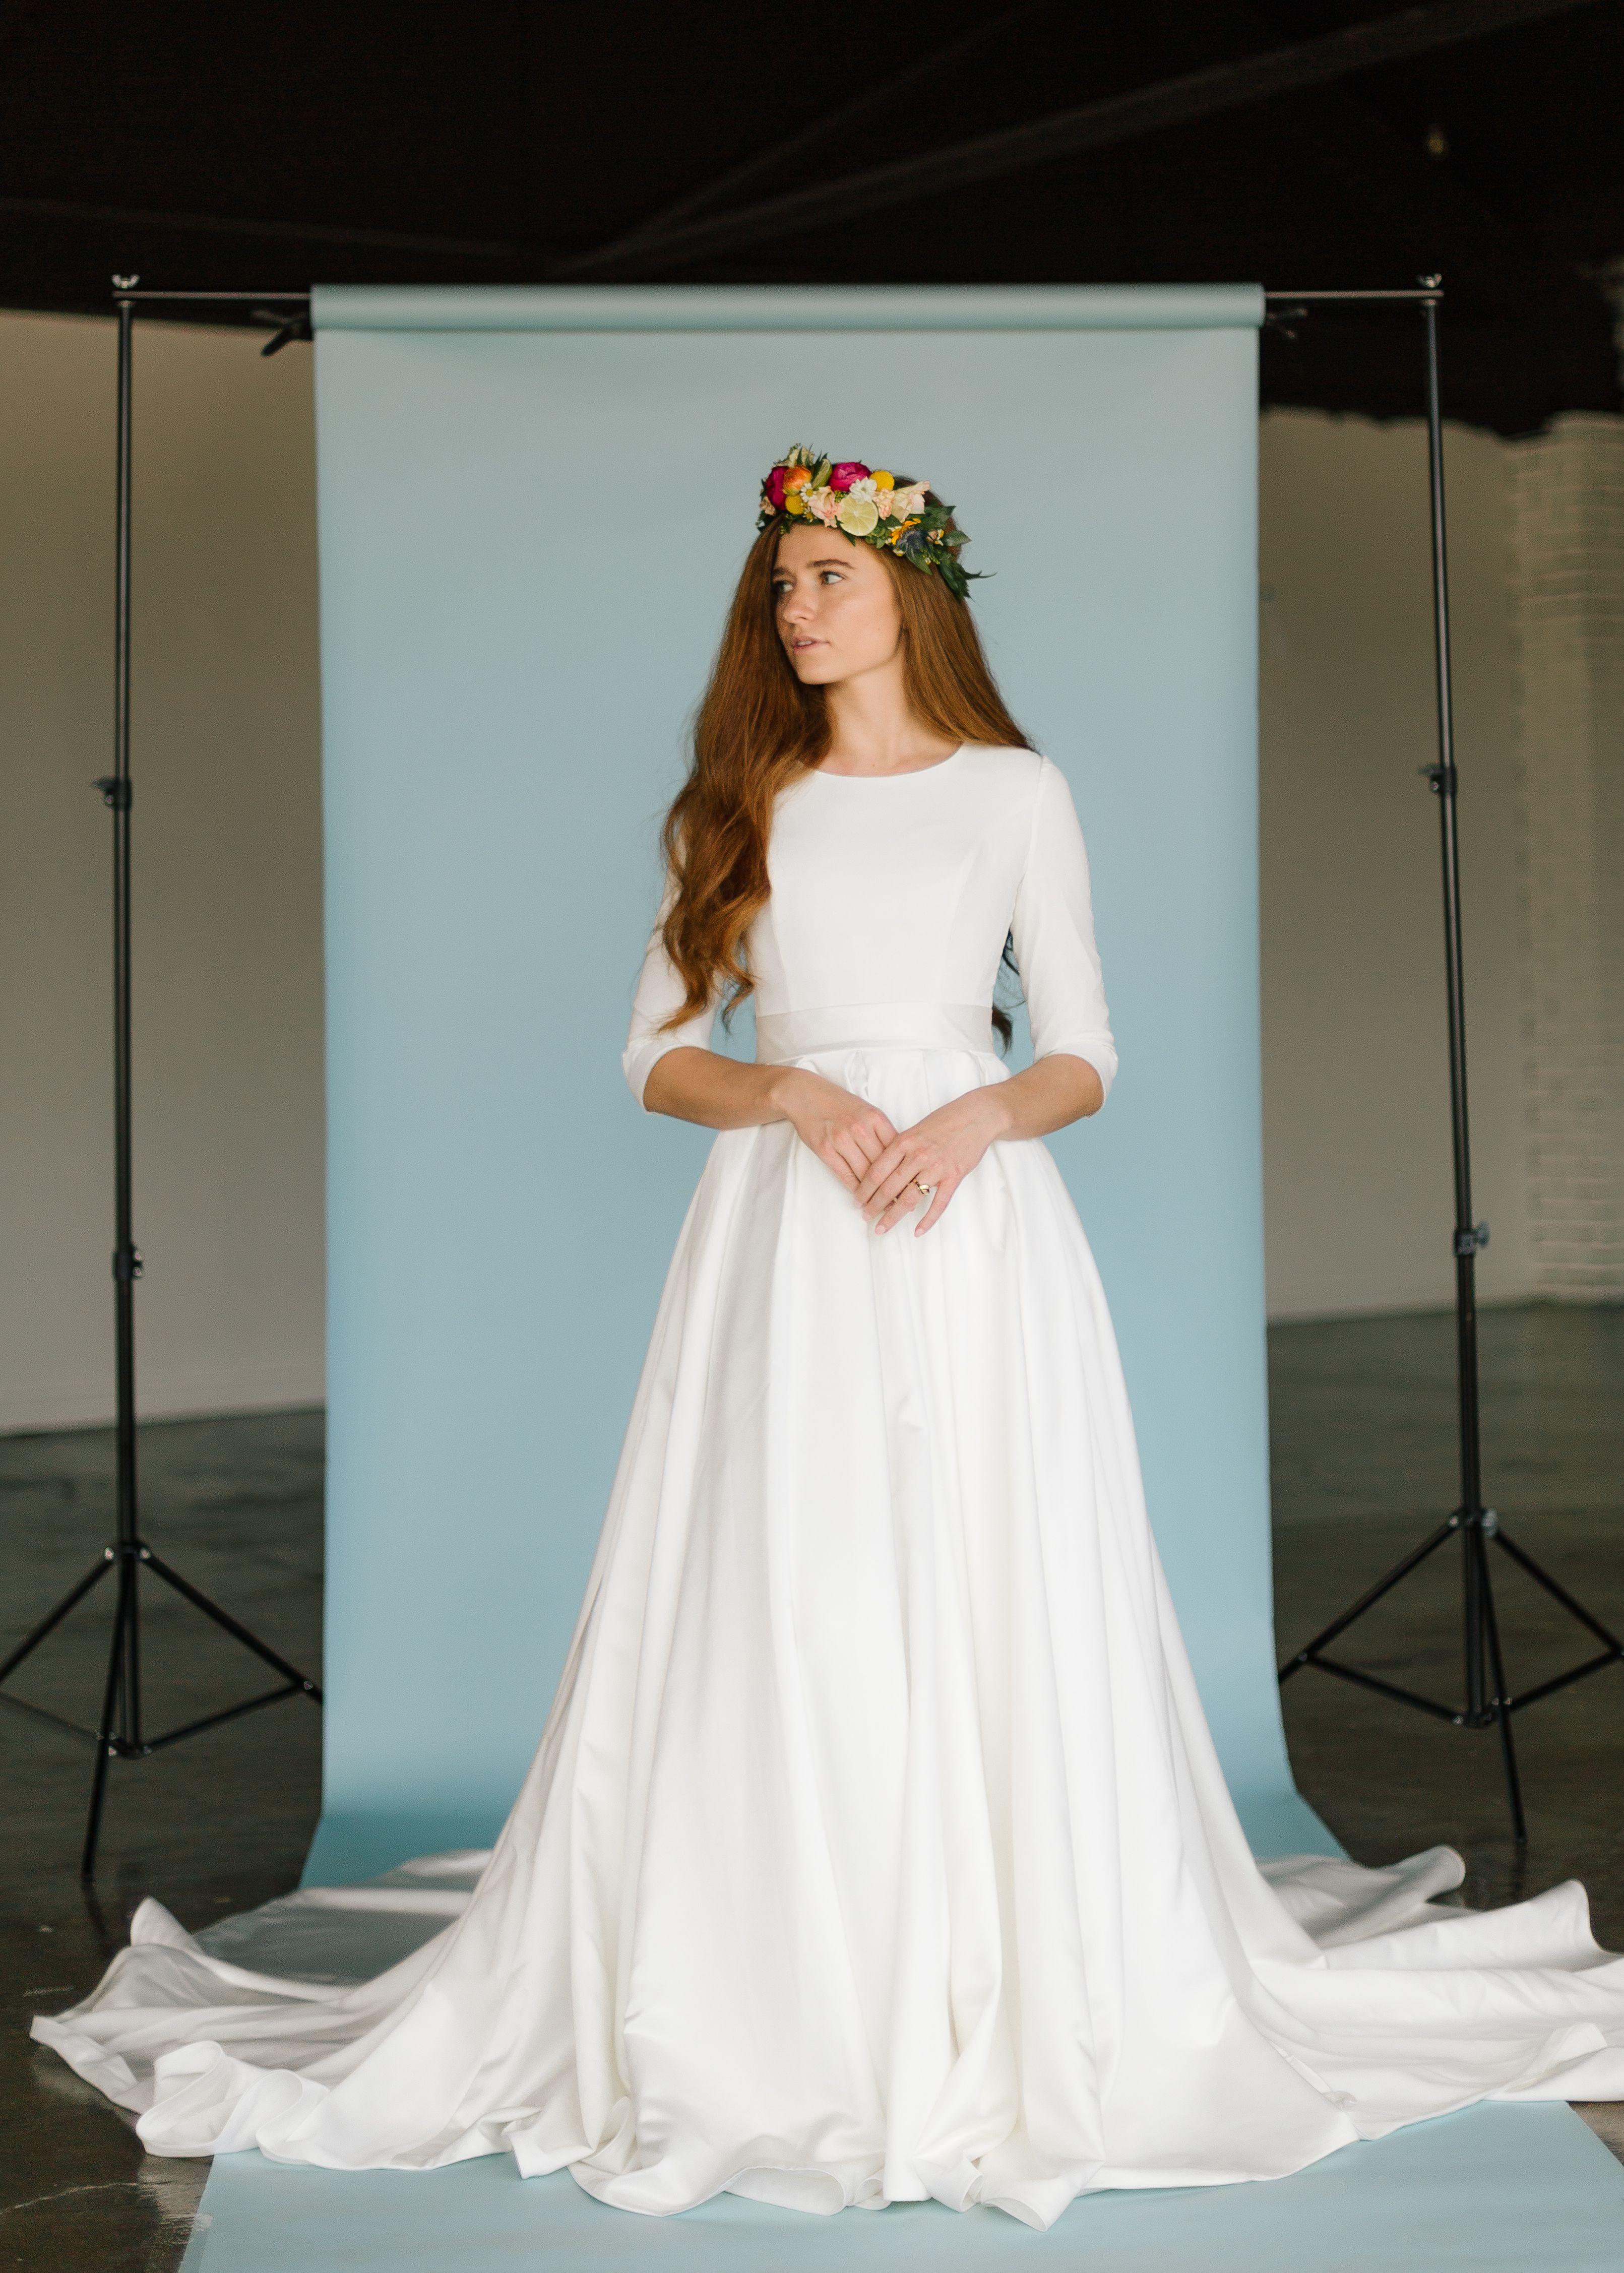 Aretha Gown By Elizabeth Cooper Design Cassandra Farley